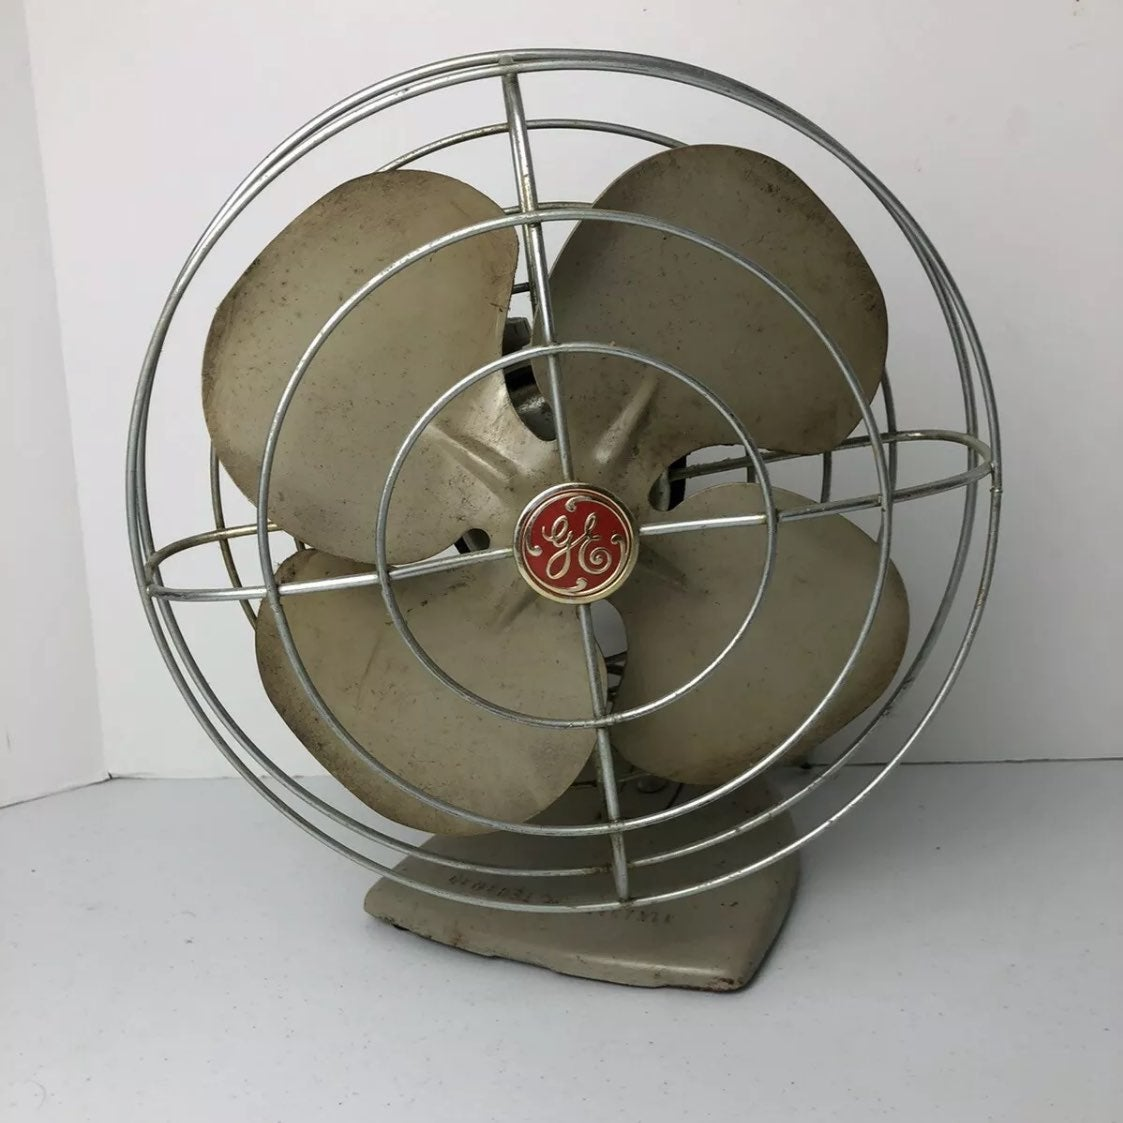 Oscilating General Electric Fan No. 74